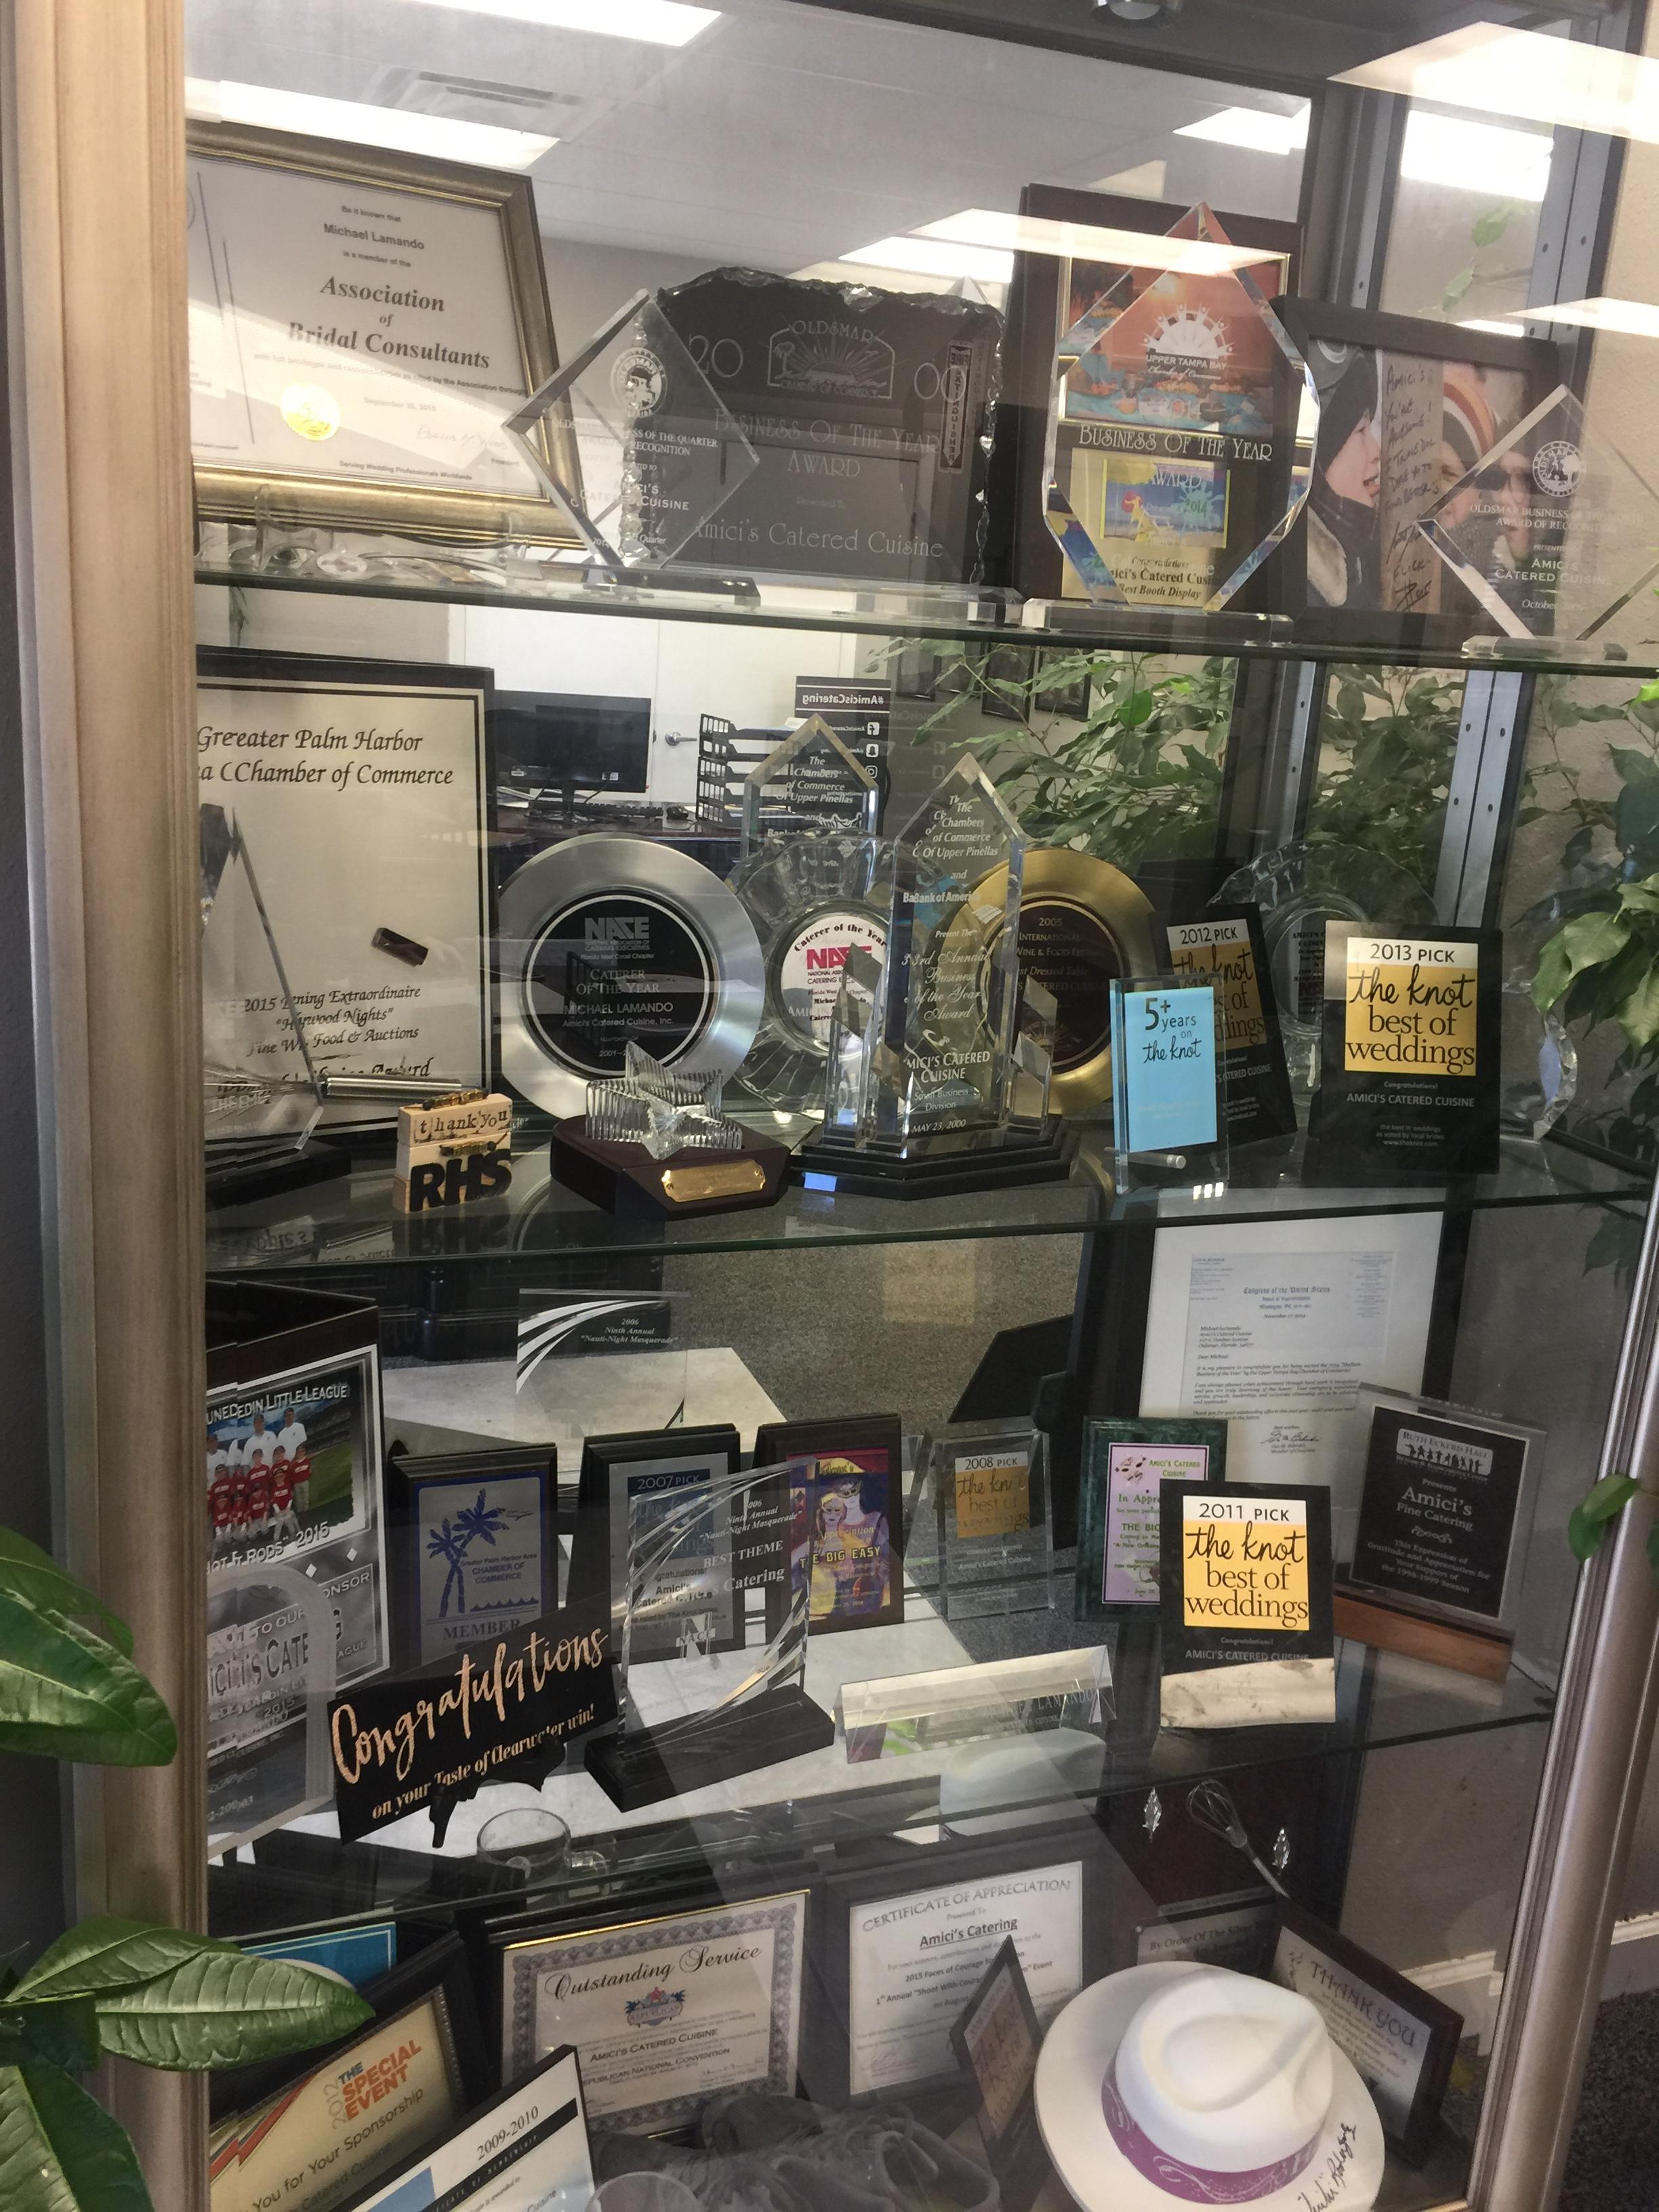 Amici's Catering Award Showcase